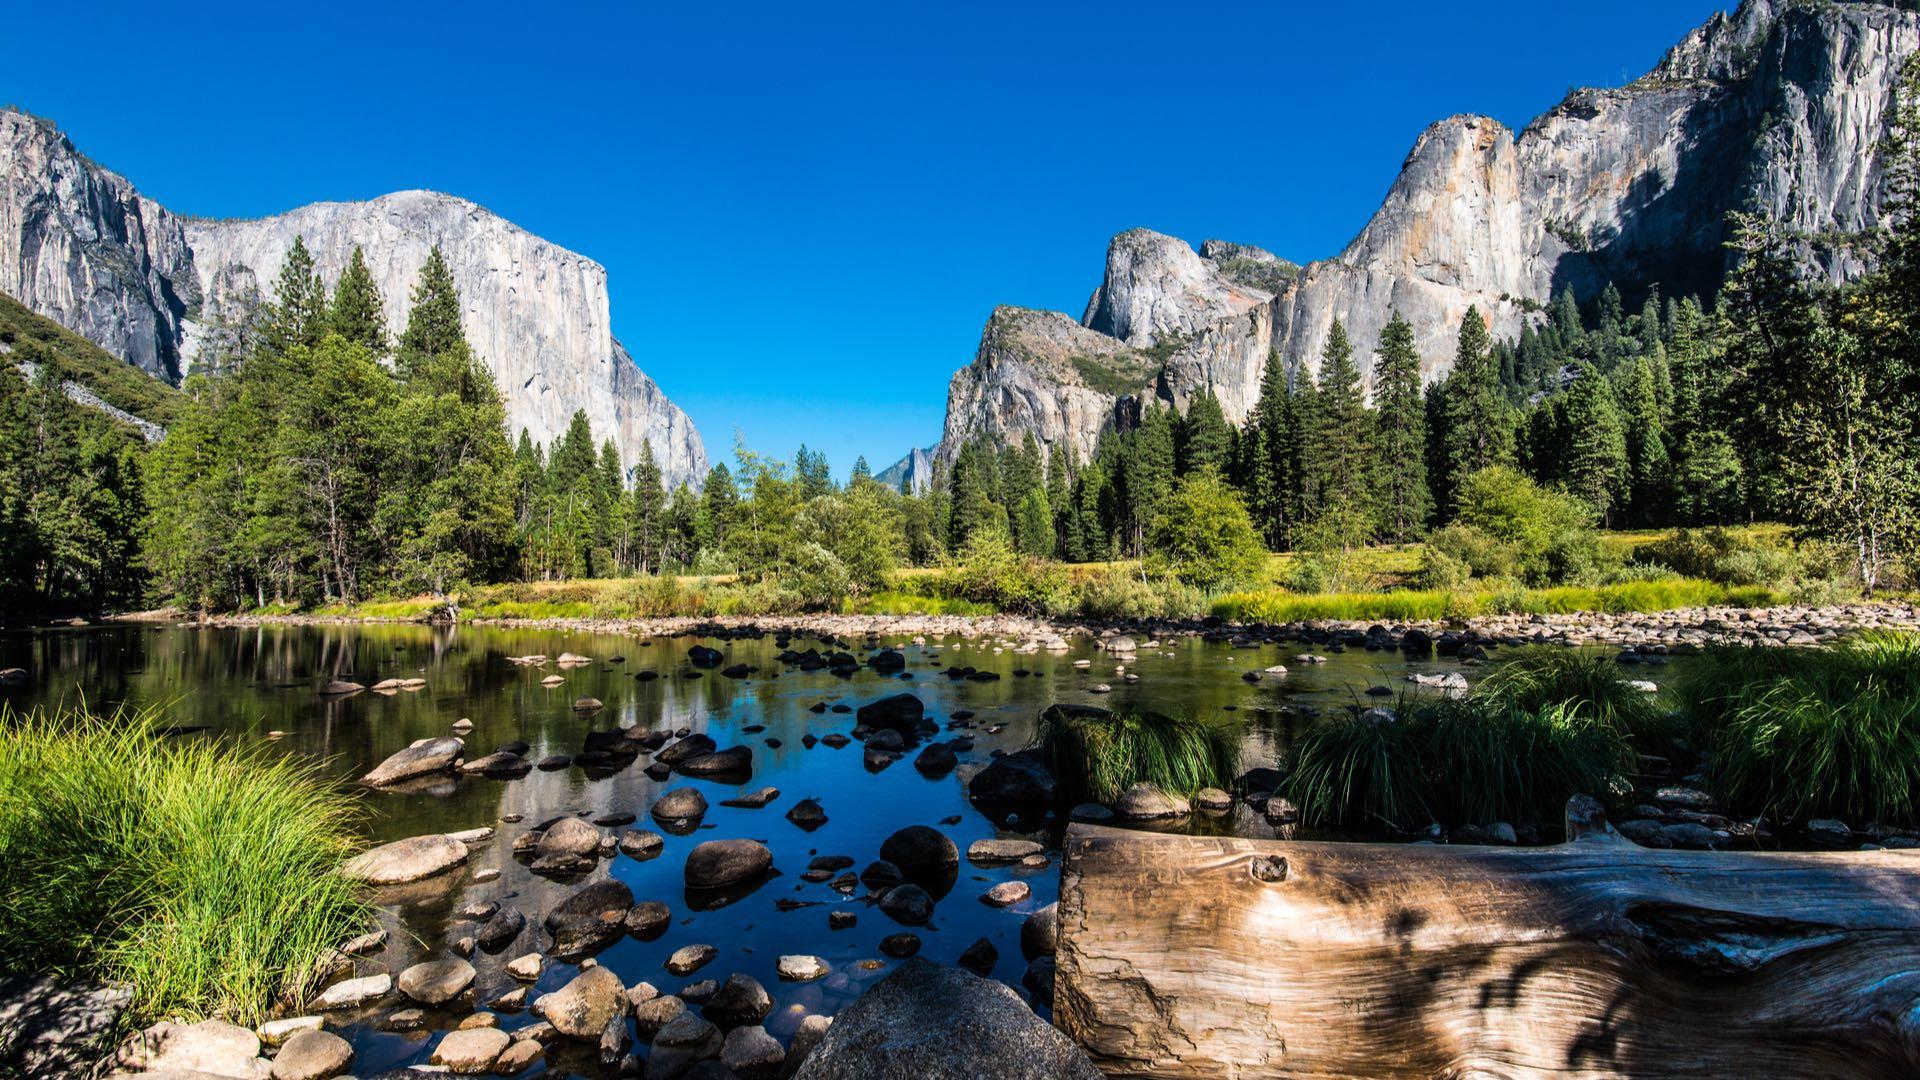 USA | Yosemite National Park | ©Mikhail Kolesnikov/shutterstock.com